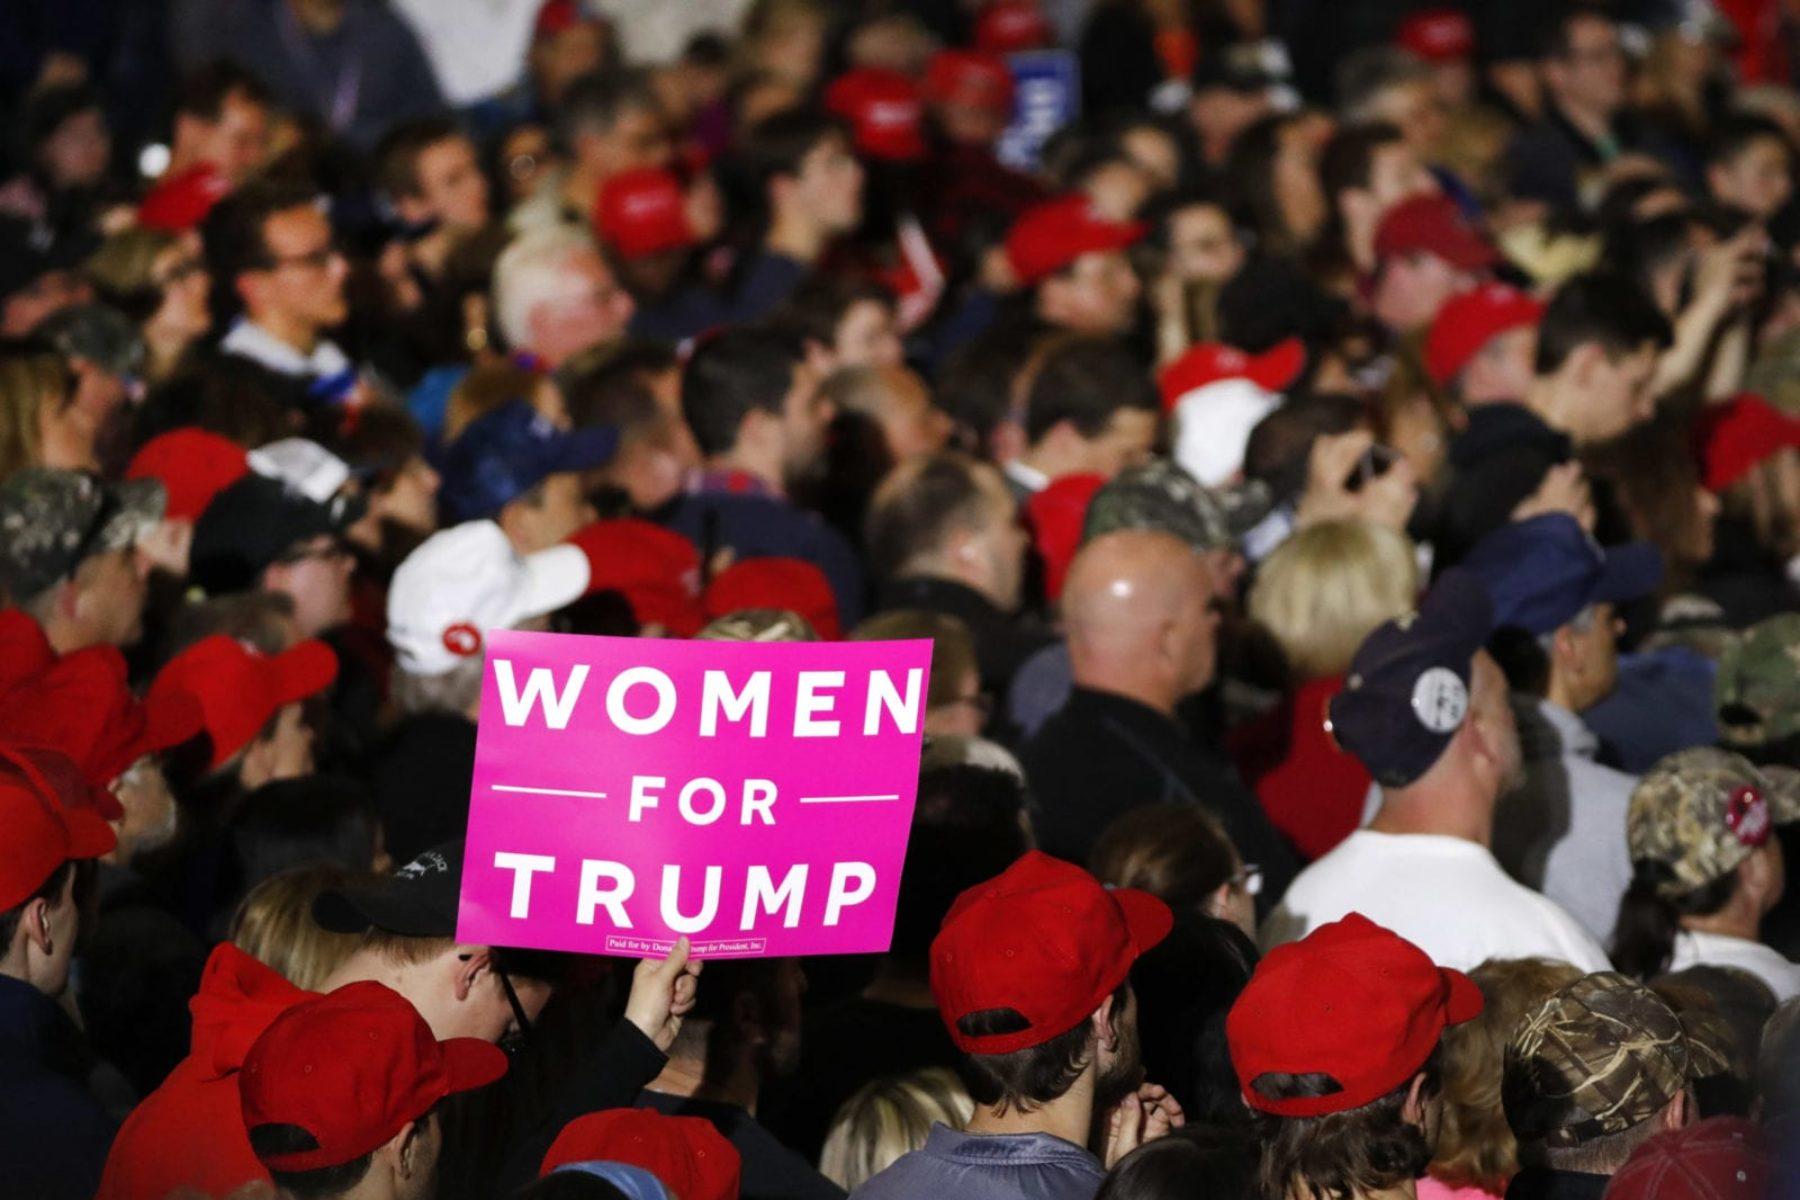 Trump rally in Michigan